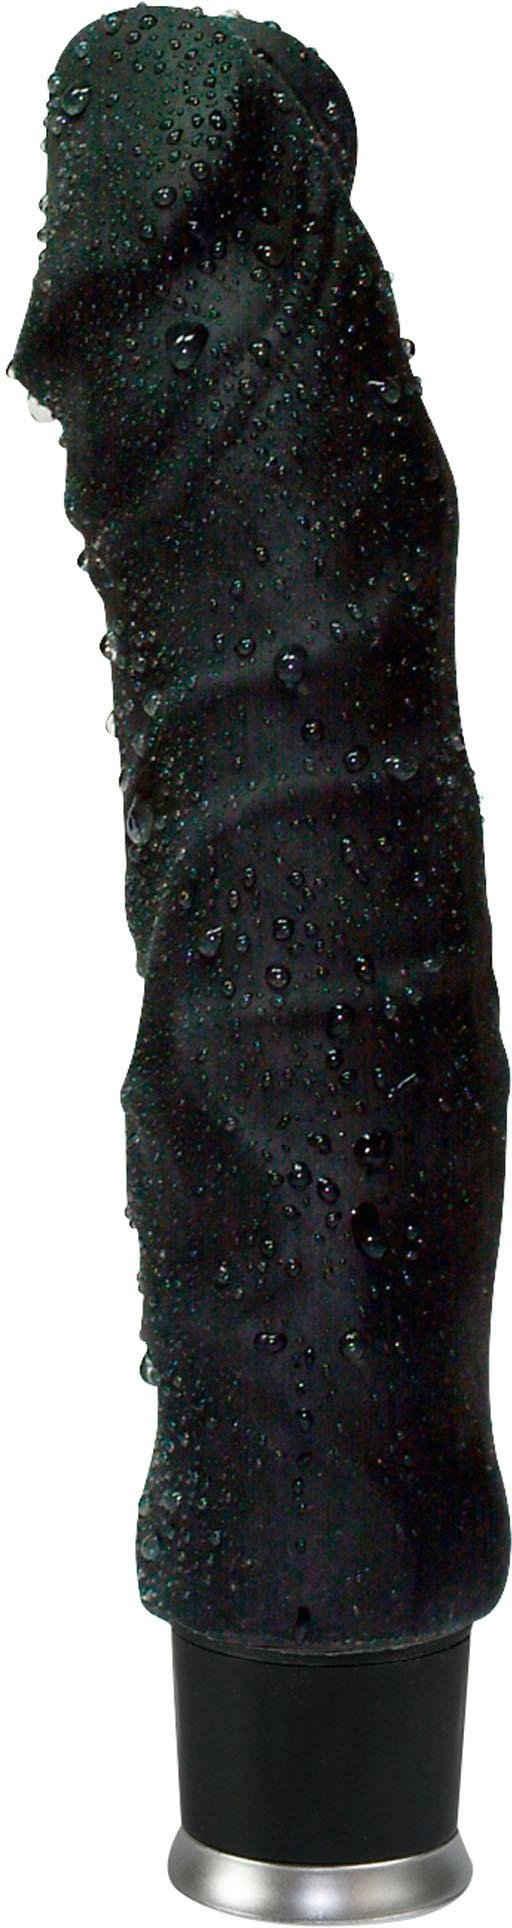 NATURE SKIN XL-Vibrator »NS Big Vibe«, schwarz